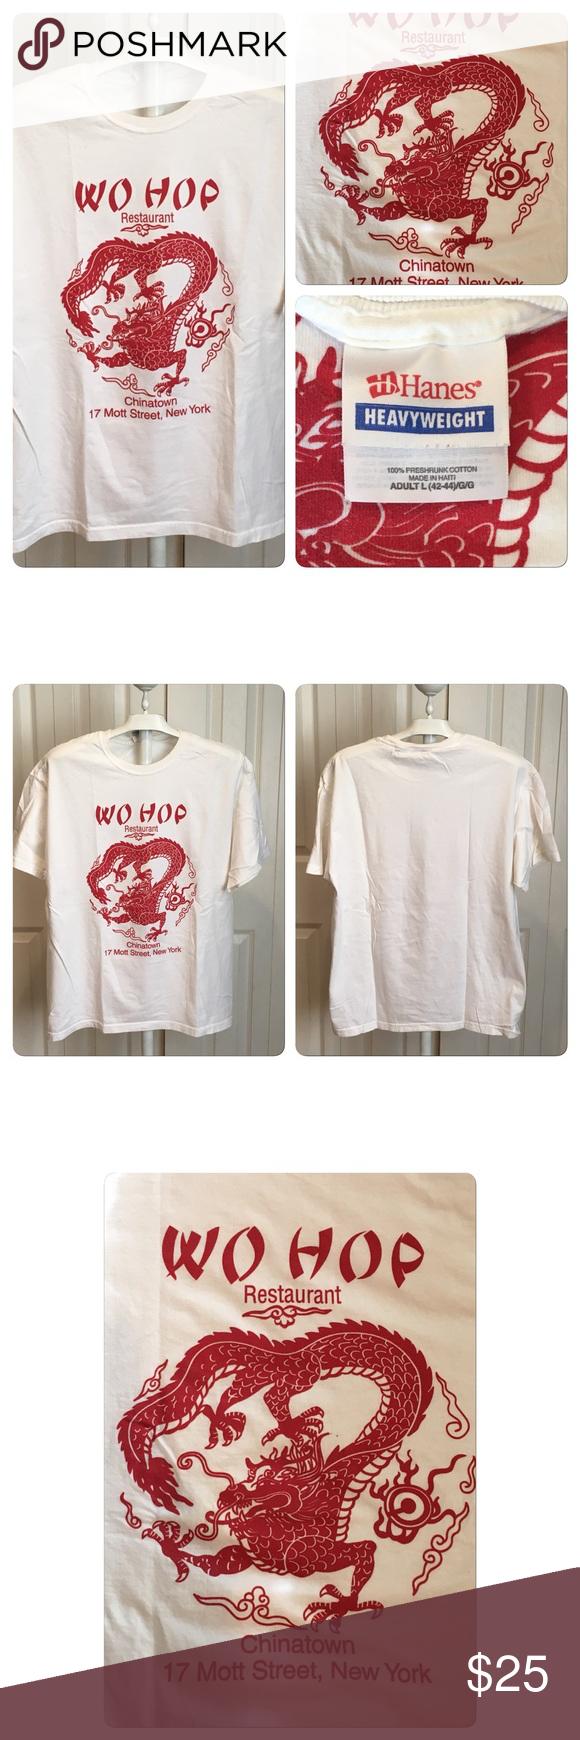 Vtg 90s Wo Hop Chinese Restaurant Dragon Tee Nyc Vintage Shirts Tees Vintage Black